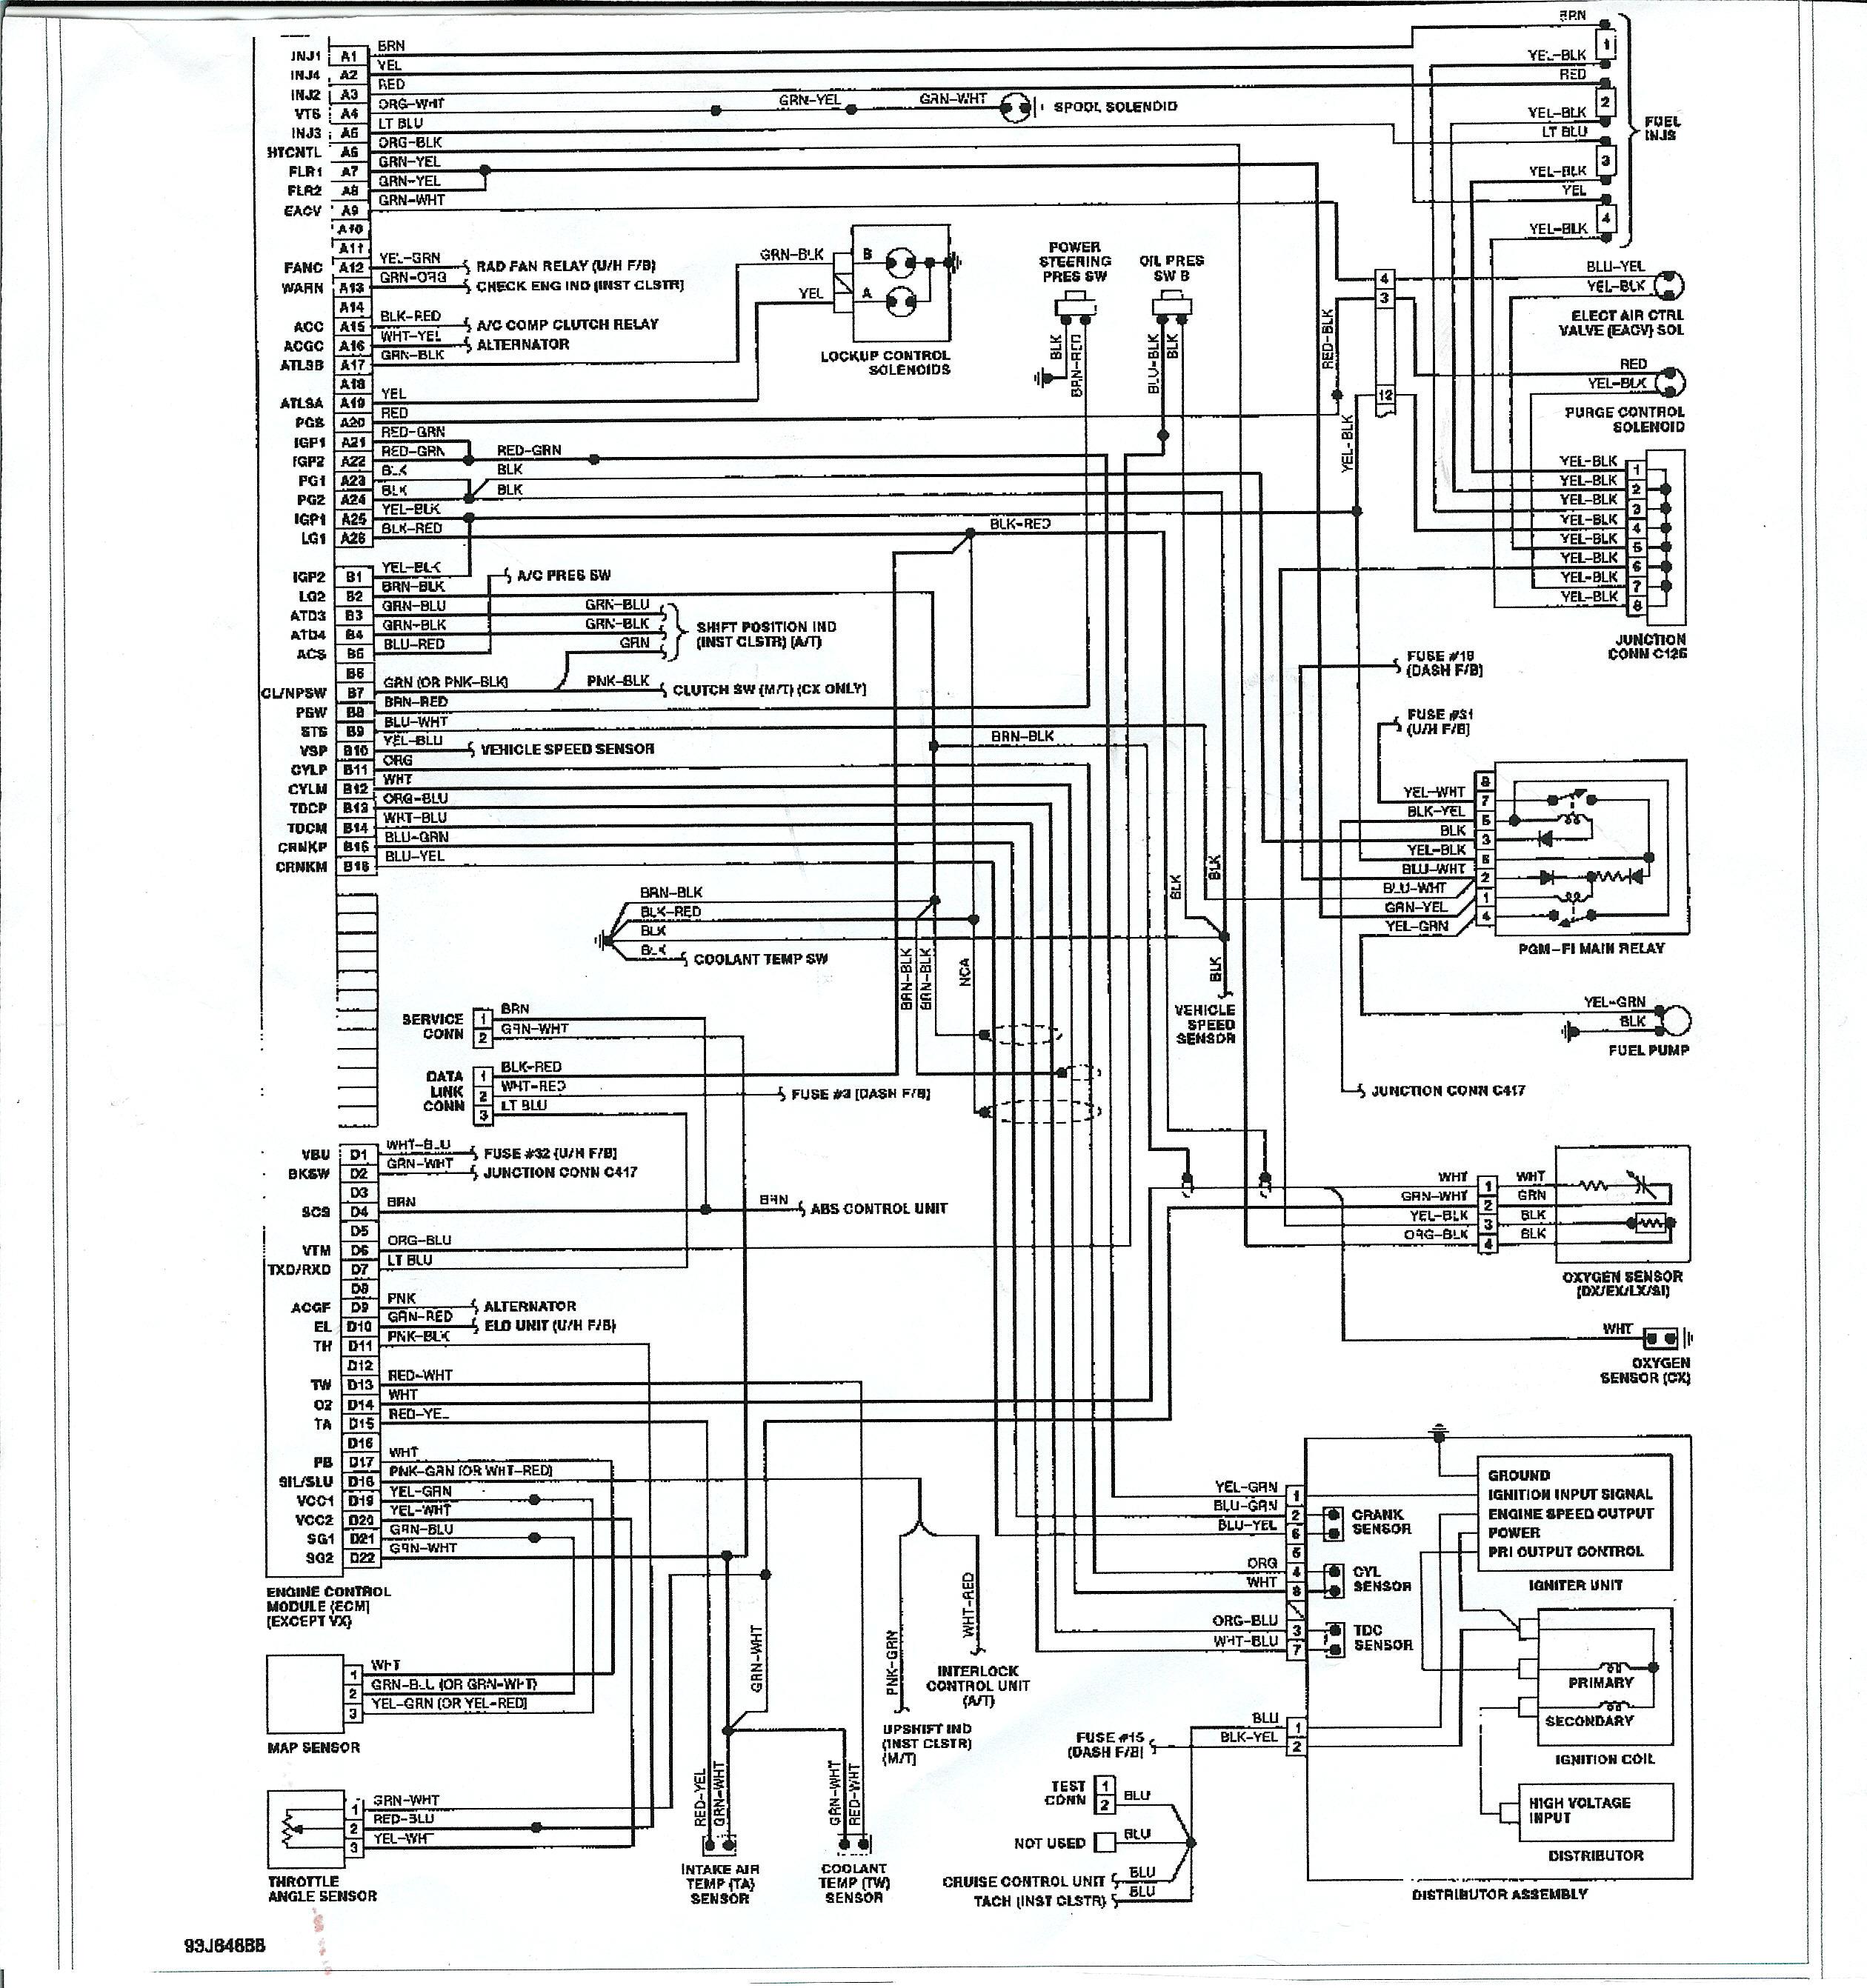 2001 Honda Civic Ecu Wiring Diagram 35 Wiring Diagram Images 2001 Civic  Fuel Pump 2001 Civic Ecu Wiring Diagram